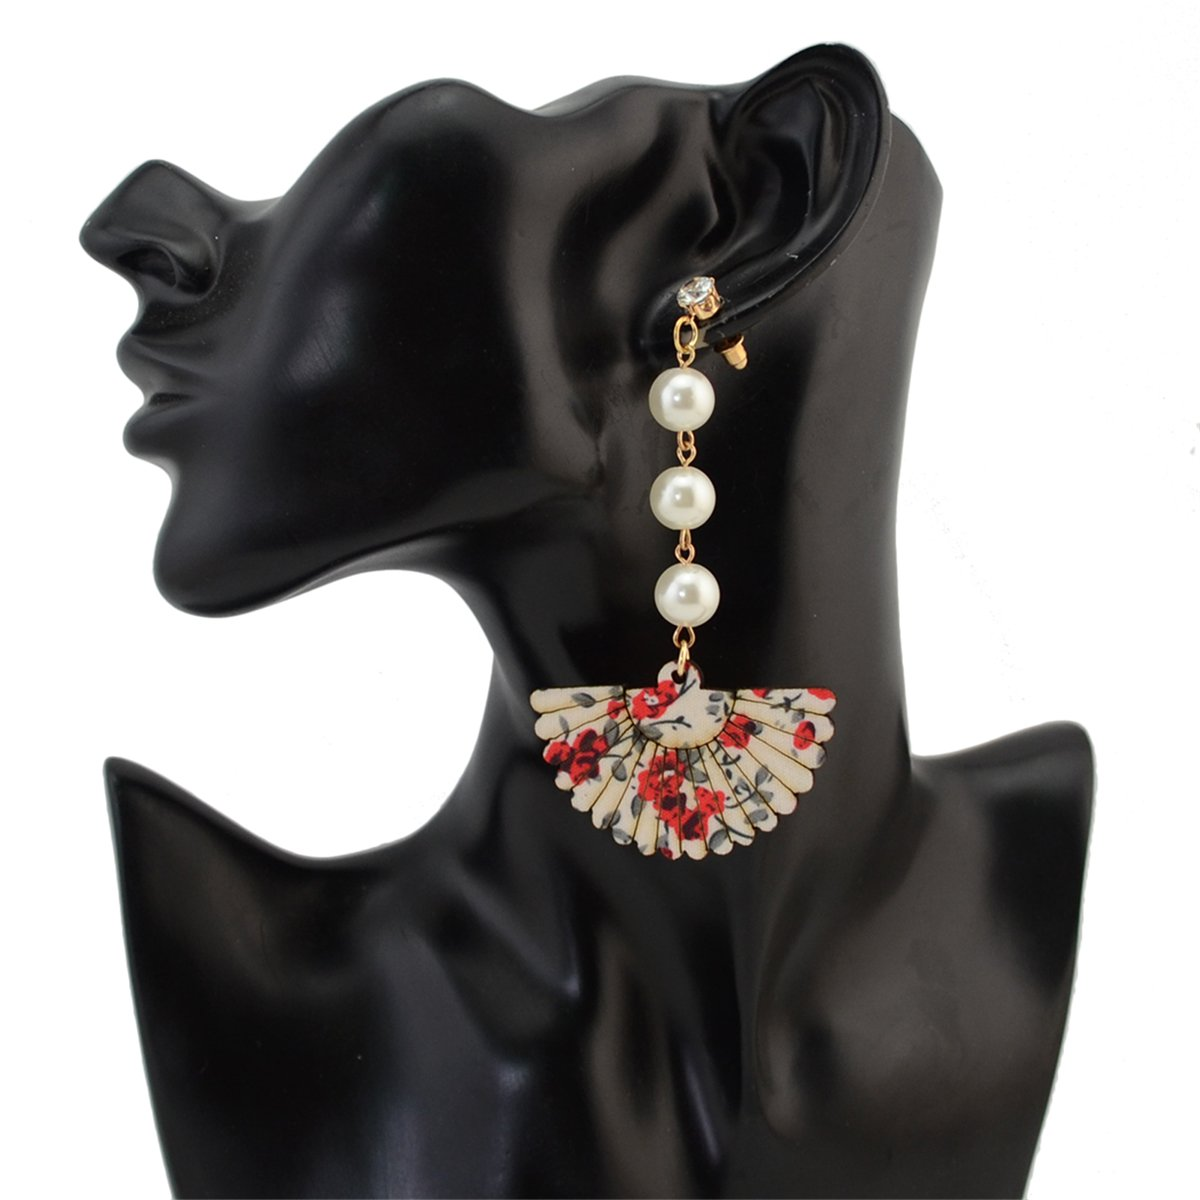 Vintage Bohemian Ethnic Sterling Silver Stabilized Tassel Fringe Turquoise Bead Stones Fan Shape Drop Earrings For Women Girls Anniversary Wedding Party Jewelry Charms